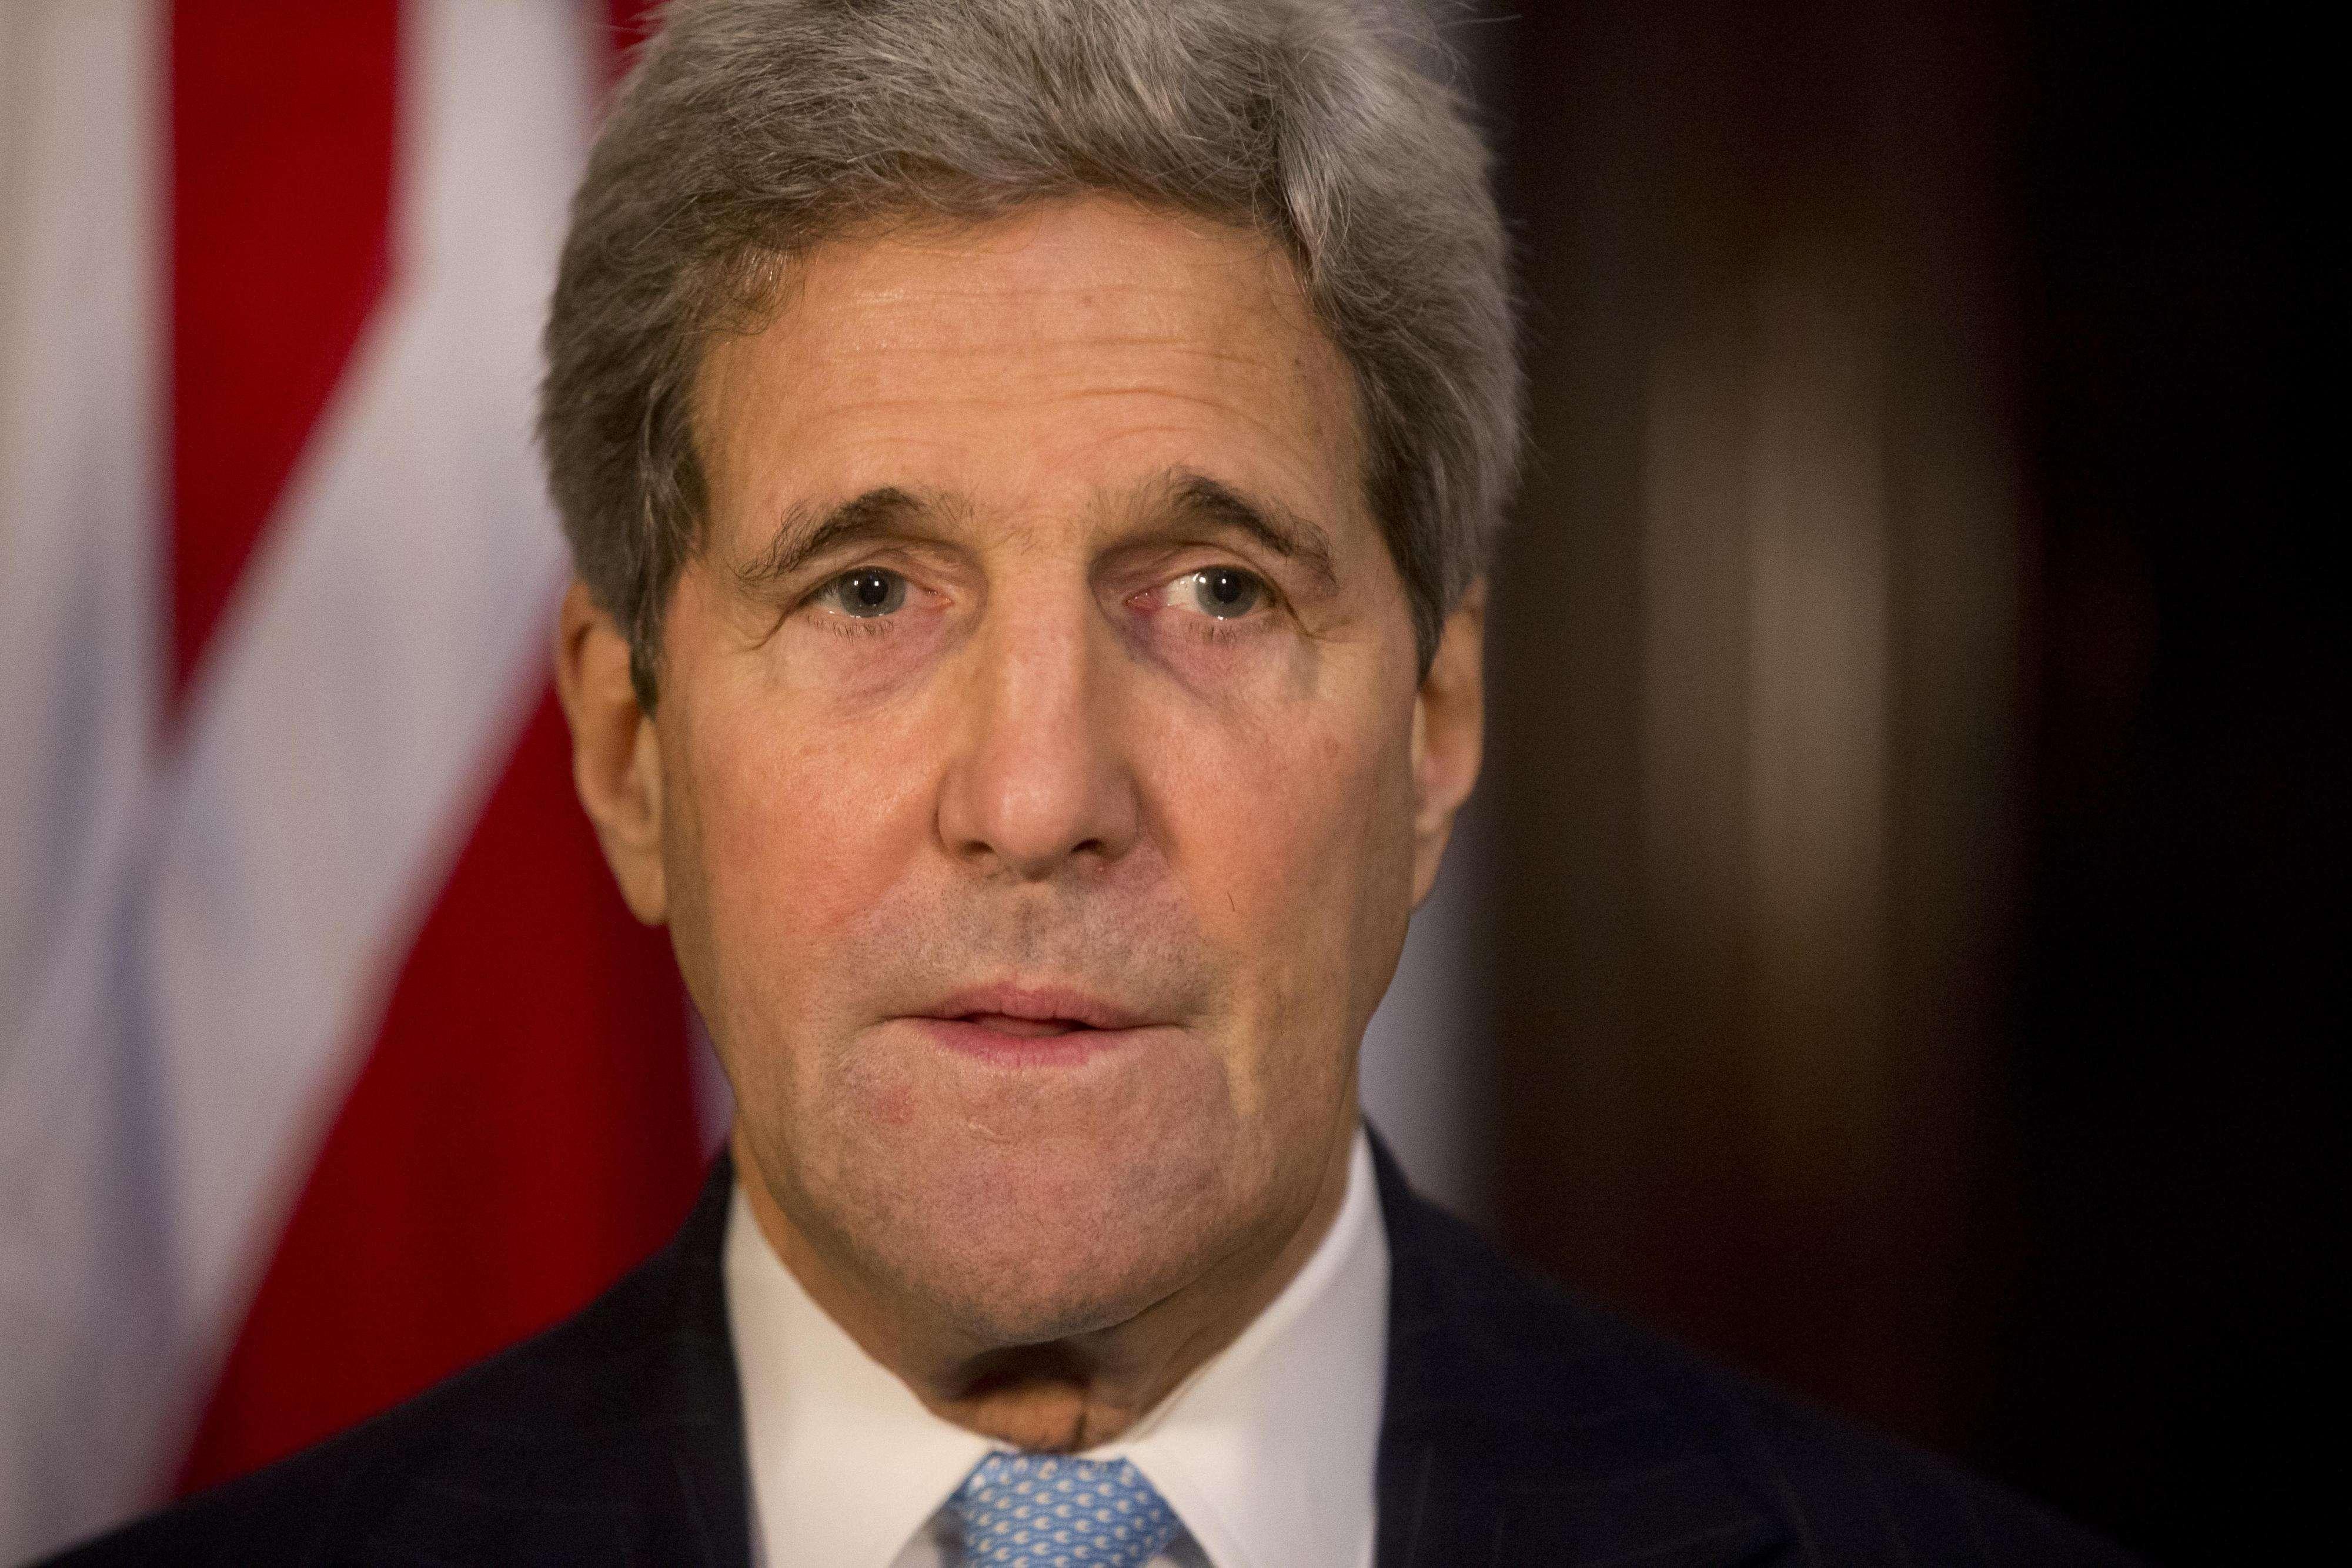 El grupo de senadores envió una carta al secretario de Estado John Kerry. Foto: Getty Images